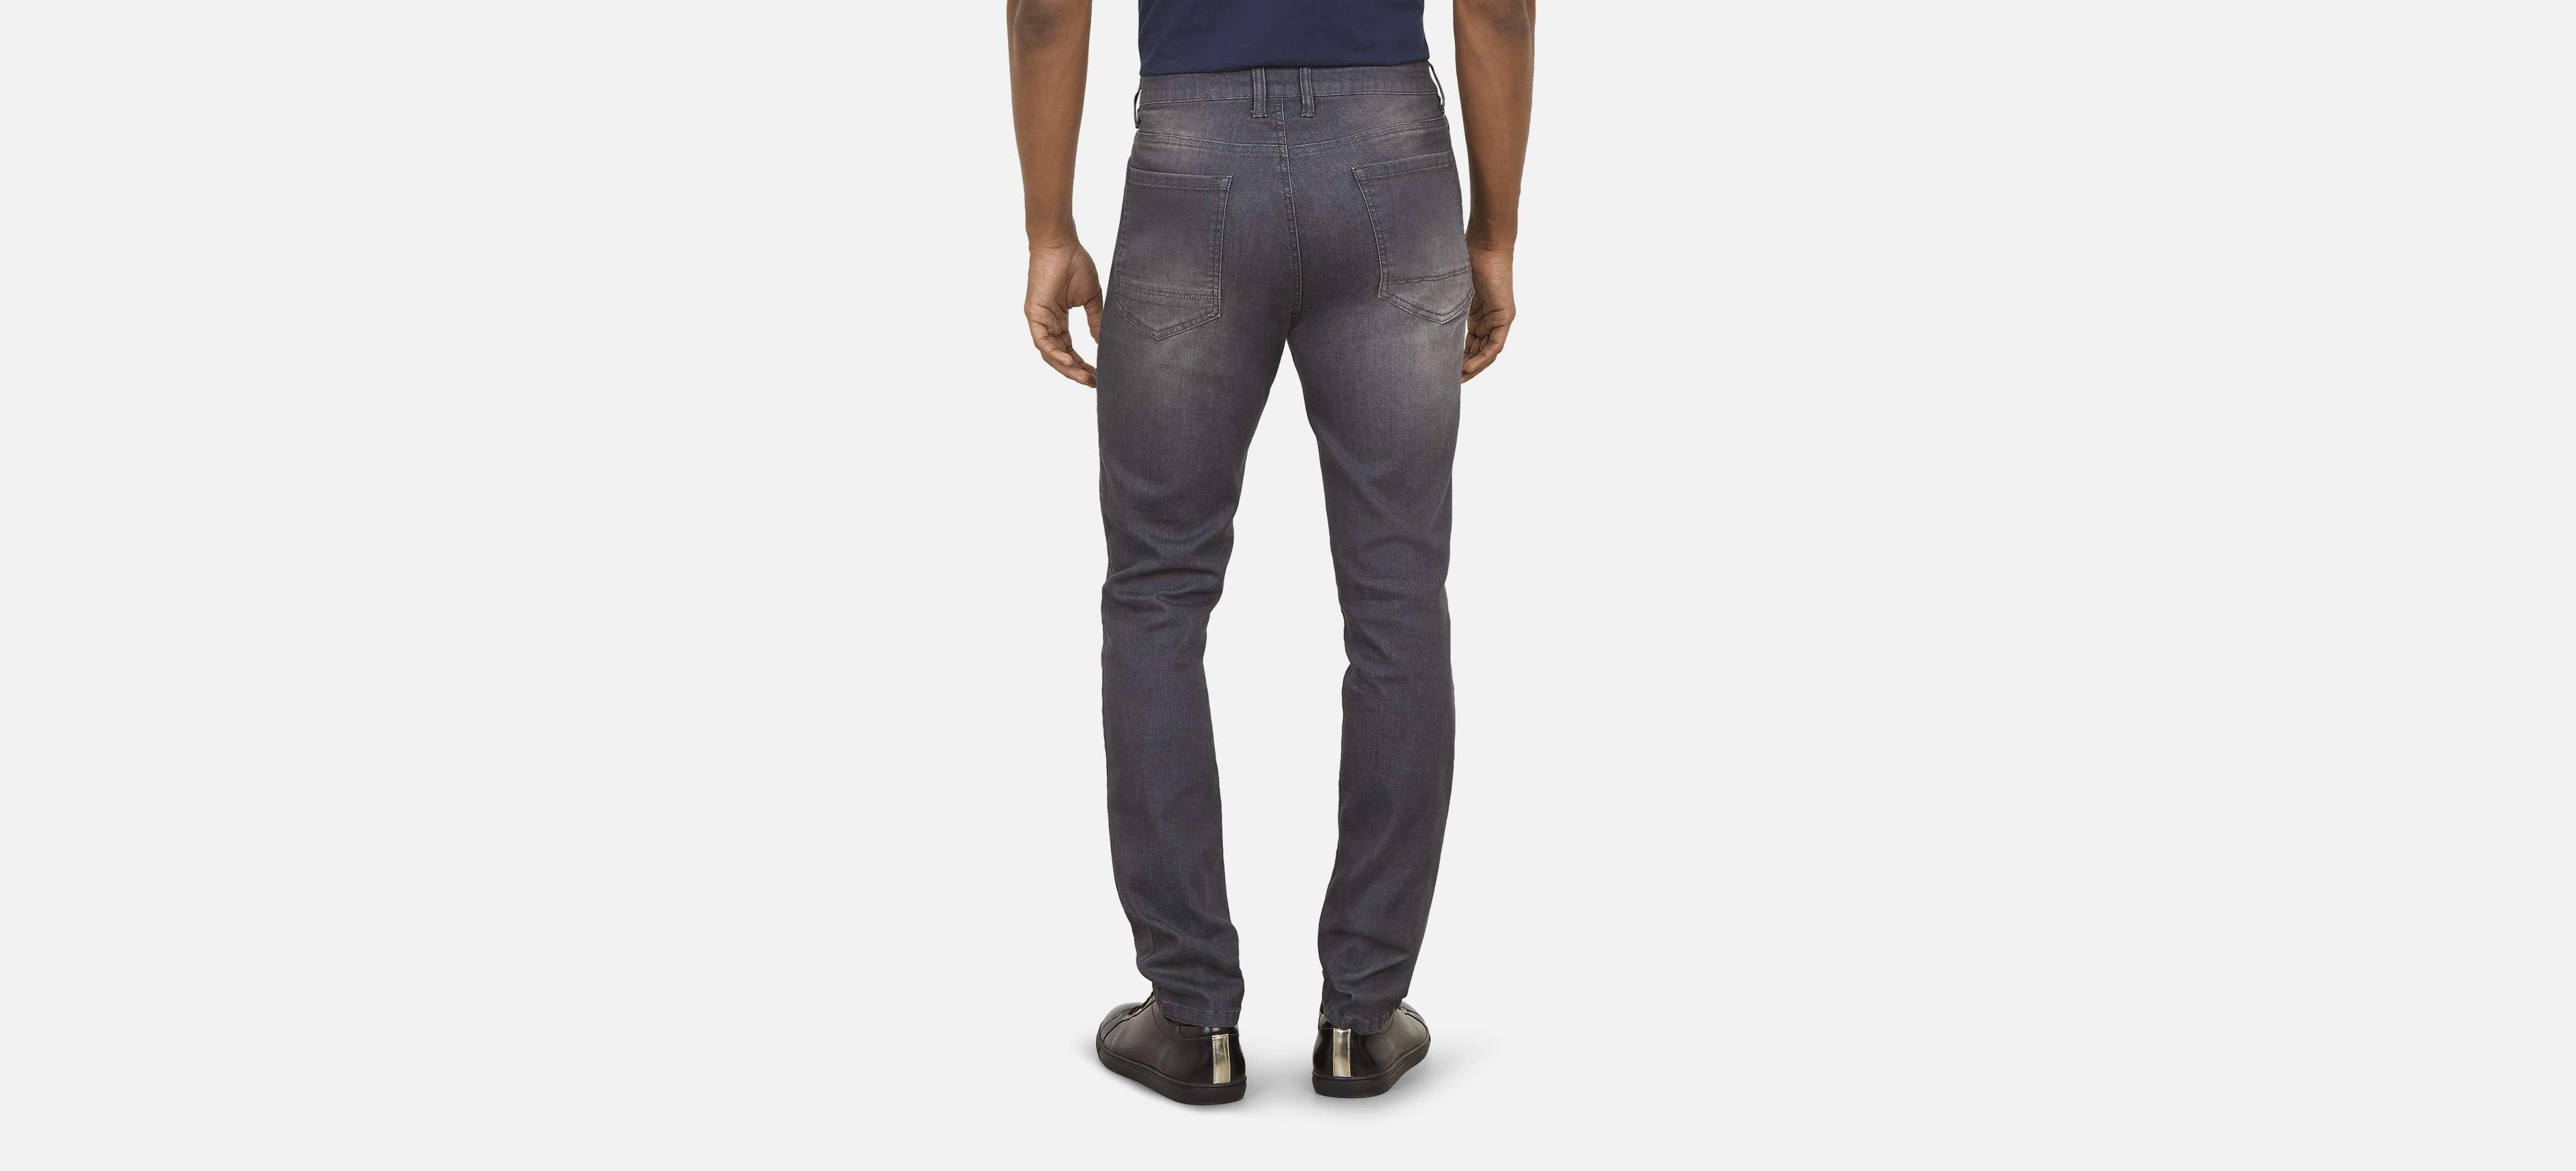 ca15ca4bfd Kenneth Cole - Gray Slim Stretch Flex Jeans for Men - Lyst. View fullscreen